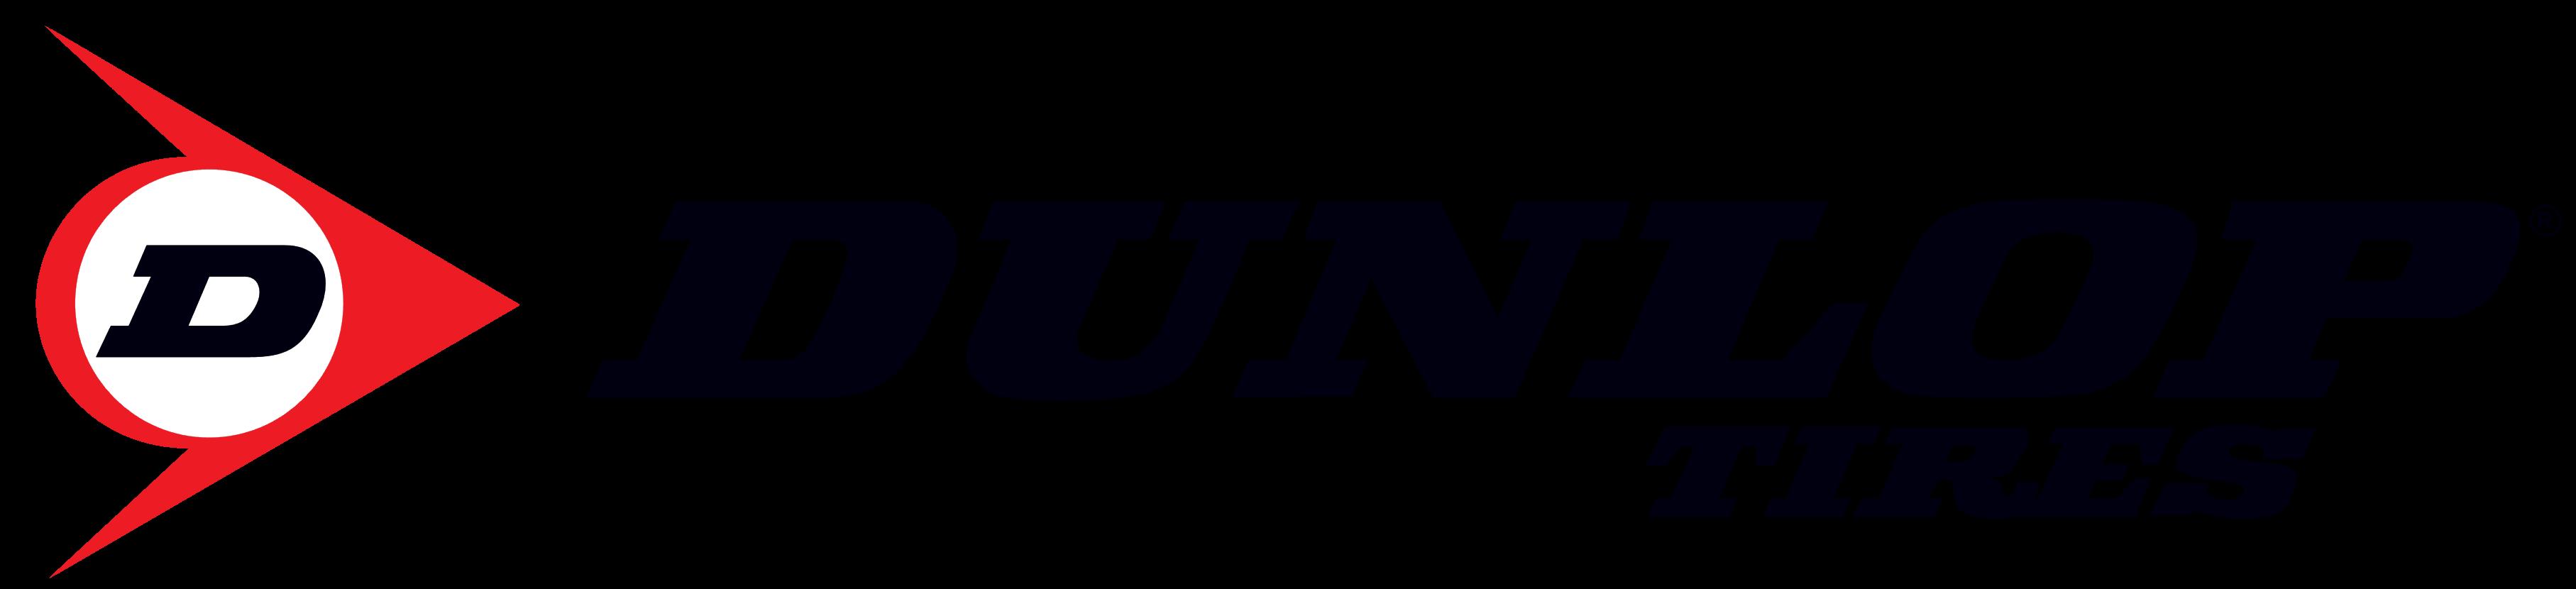 Dunlop PNG - 110430